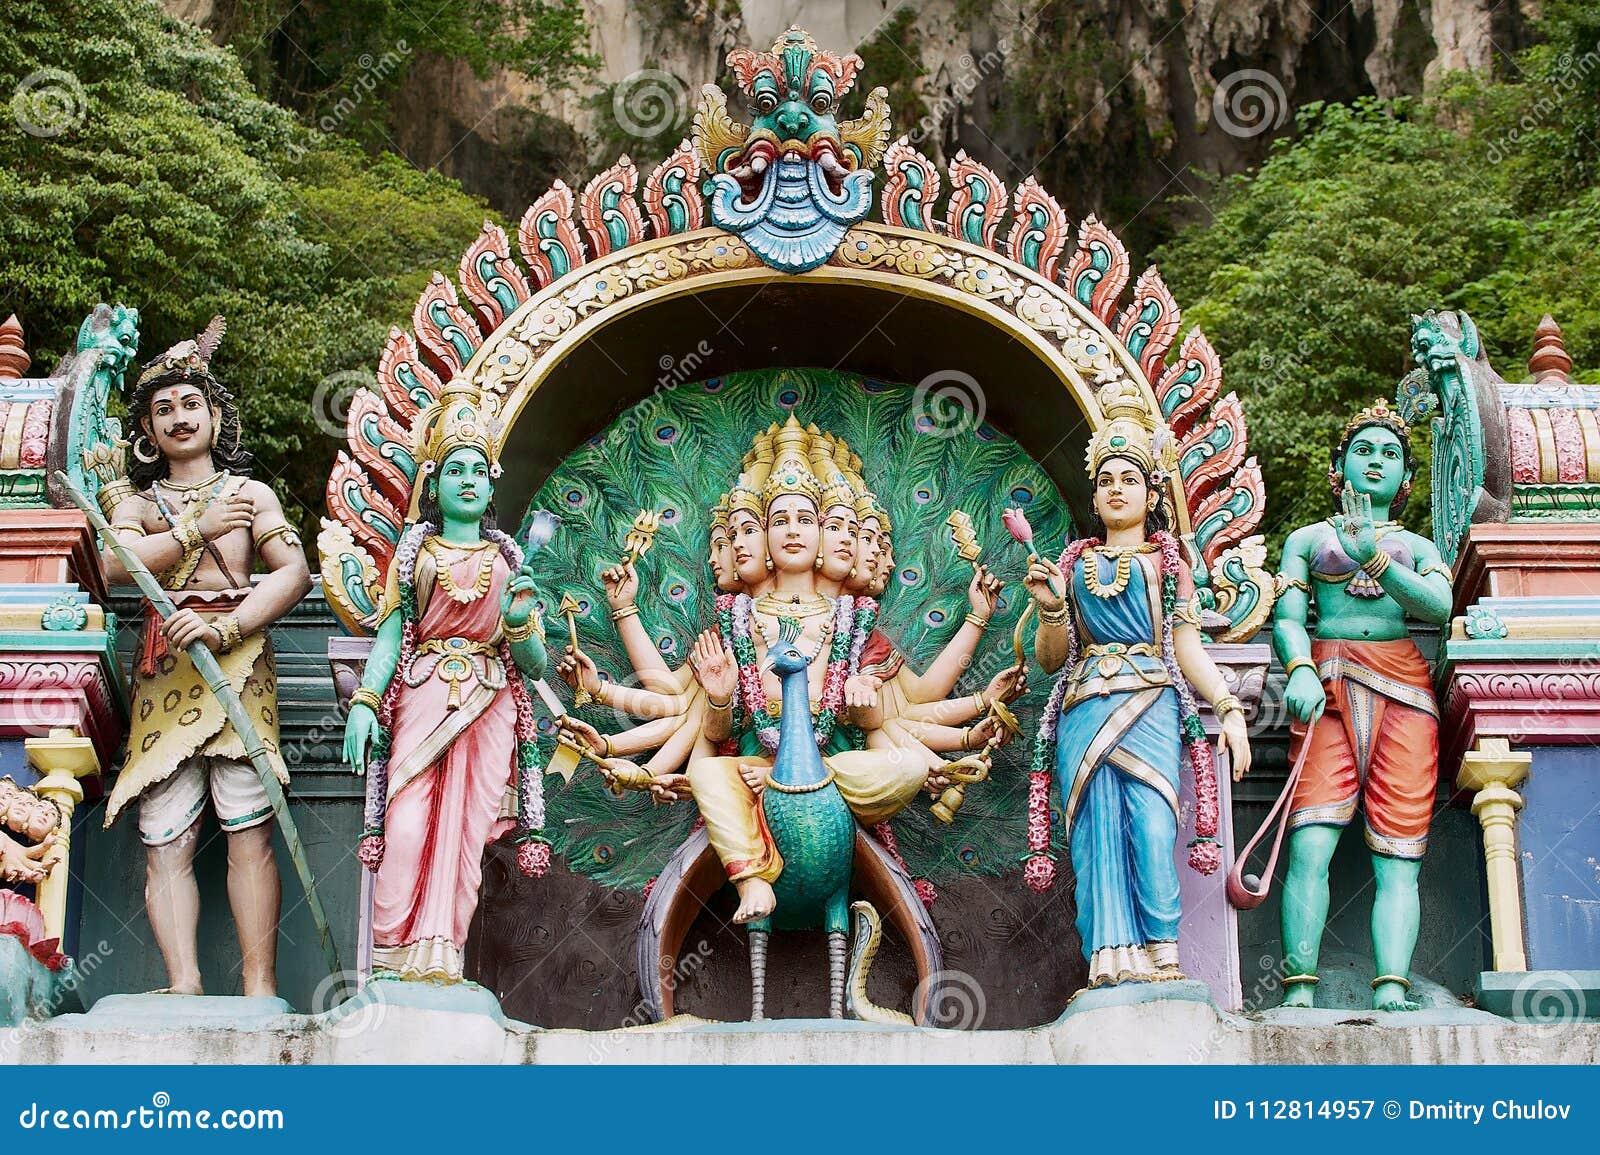 Statues of Hindu gods at the entrance to the Batu caves in Kuala Lumpur, Malaysia.